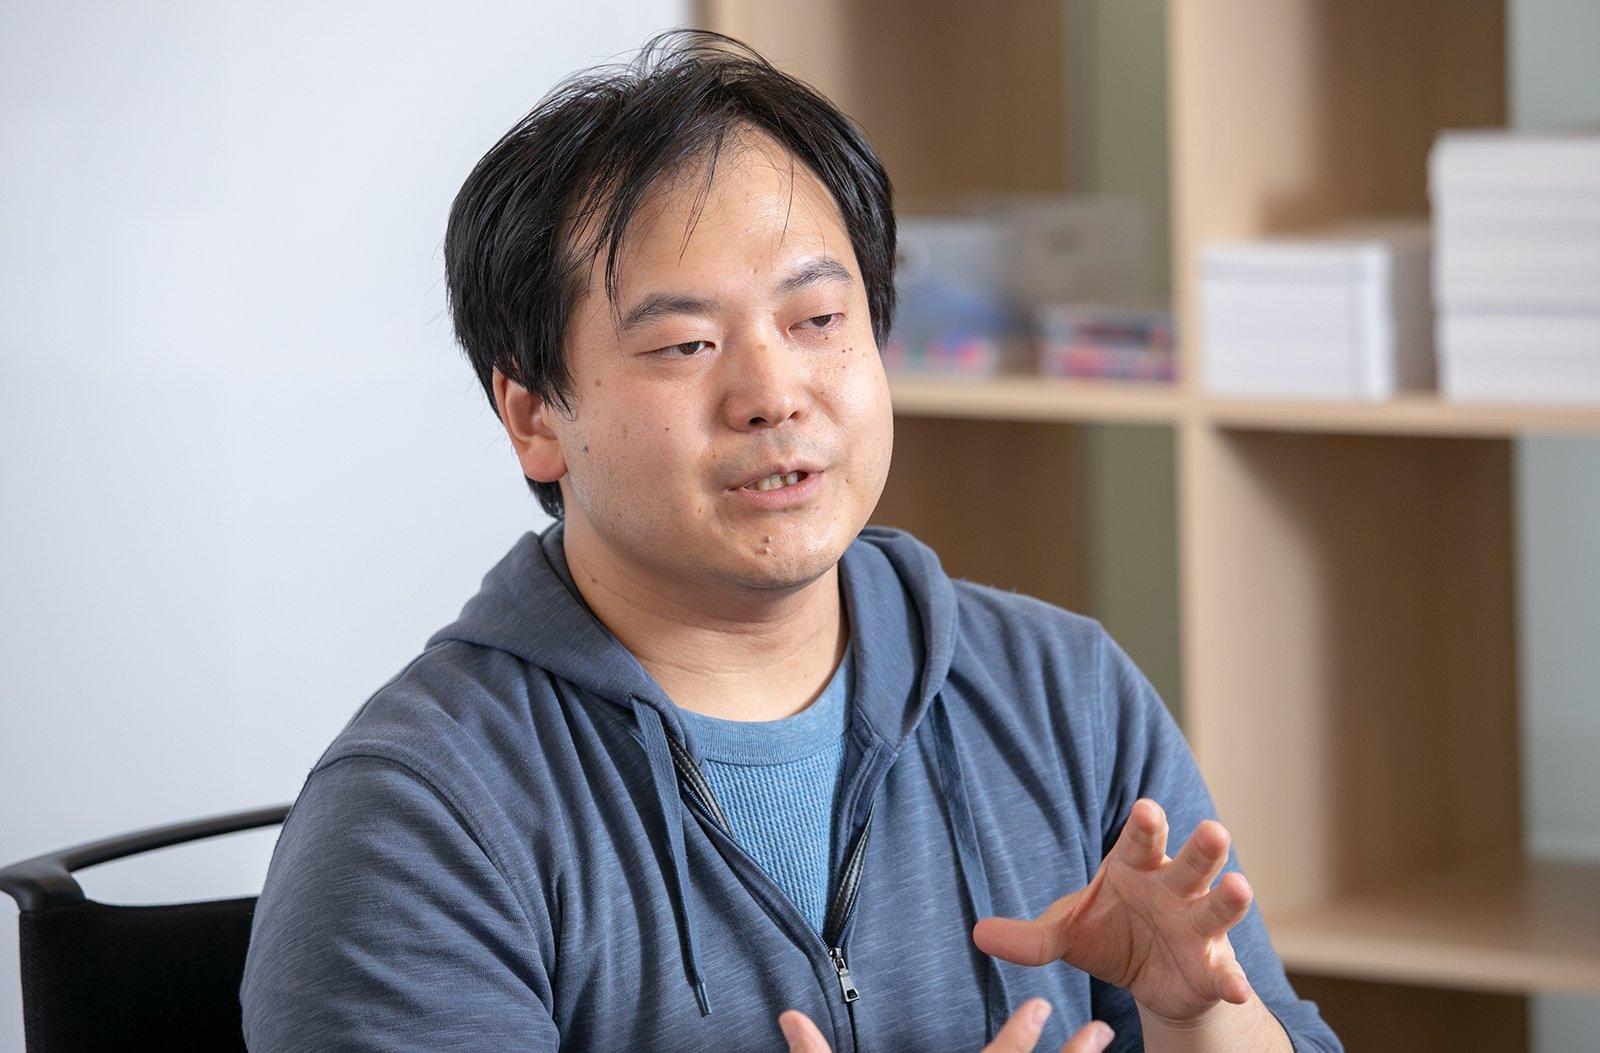 Photo: Toshiyuki Shiwa, Chief Engineer, QUANTUM Inc.